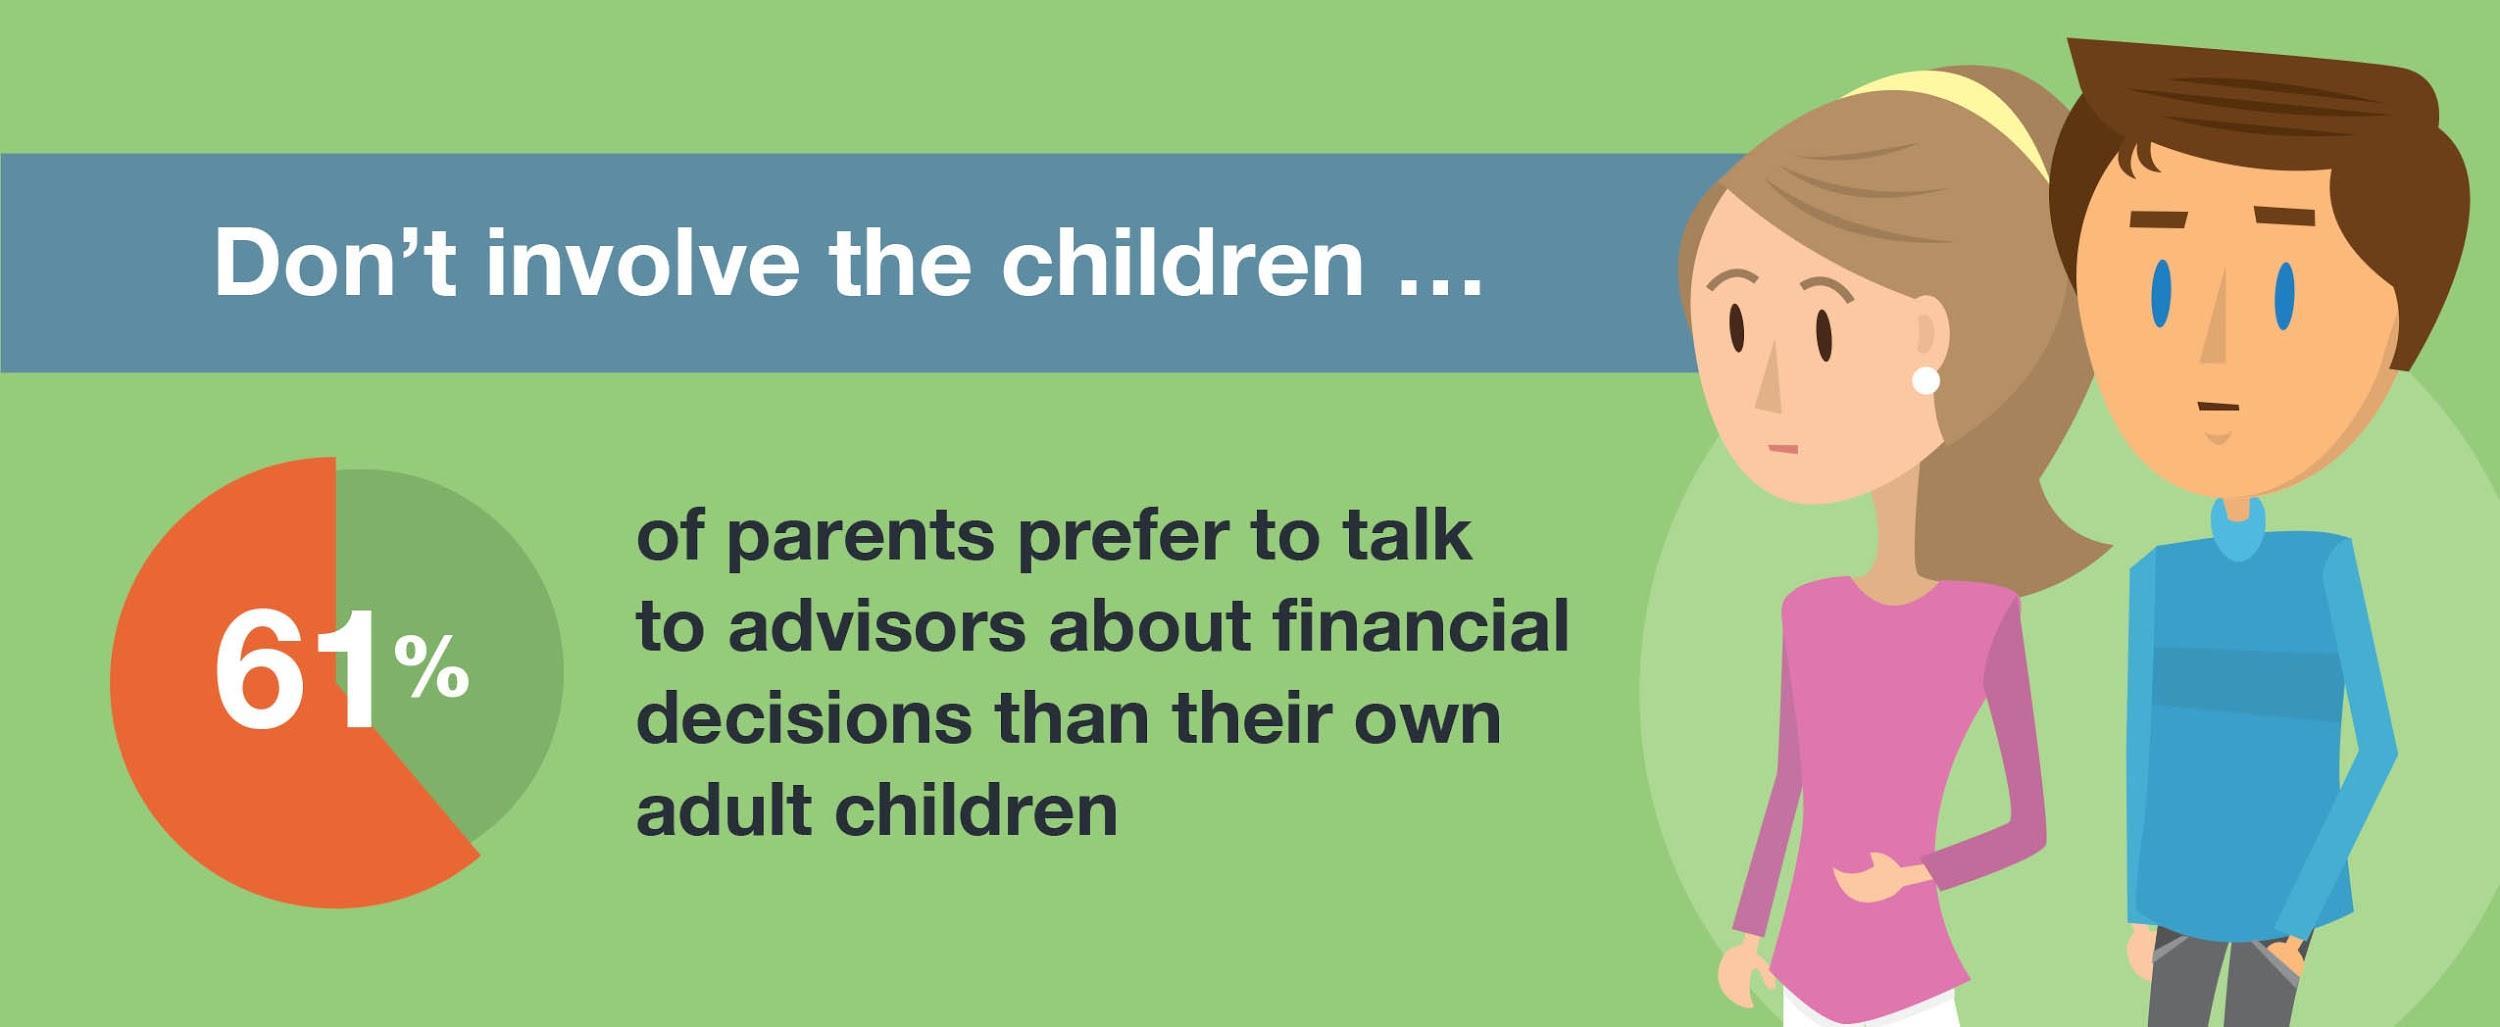 Adult children dont get asked about finances